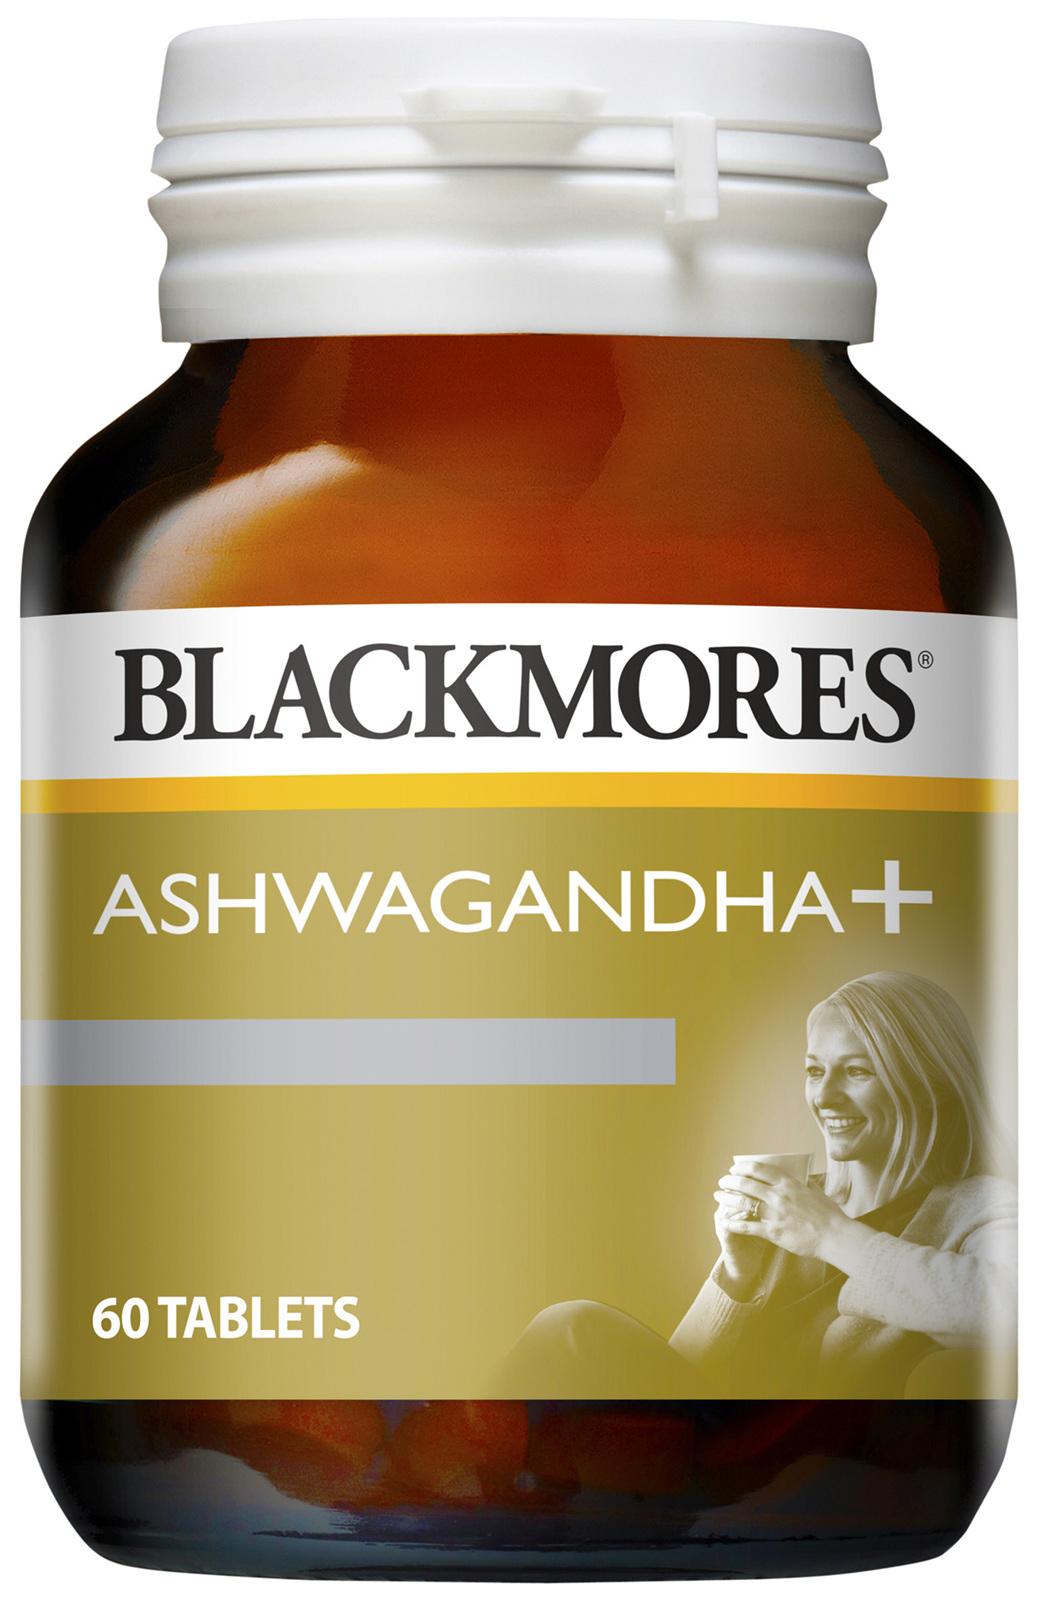 blackmores ashwagandha 60 tablets  galluzzo's chemist